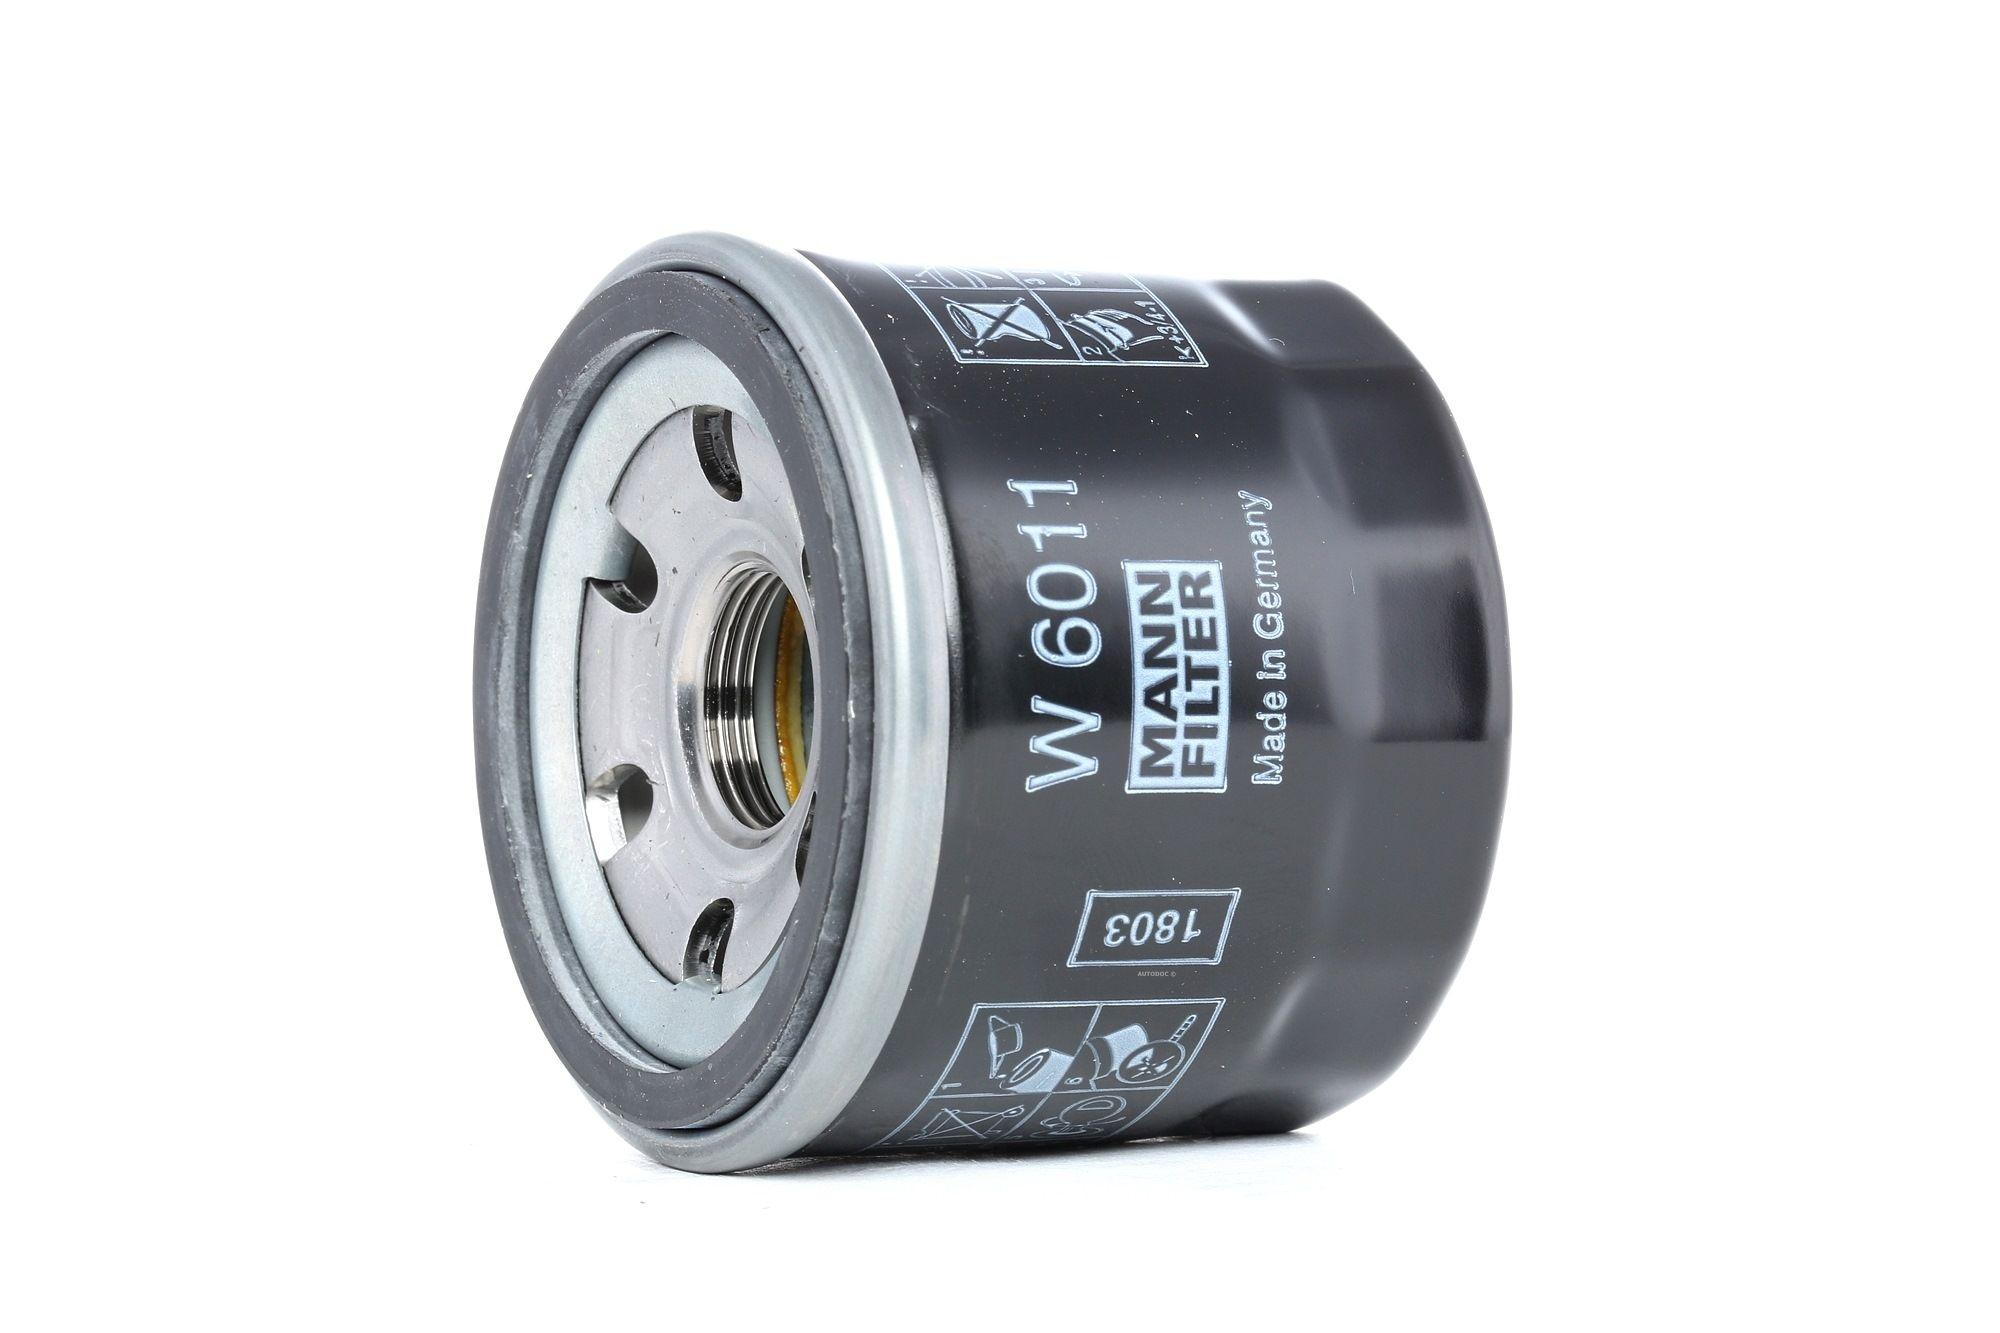 MANN-FILTER: Original Motorölfilter W 6011 (Innendurchmesser 2: 54mm, Innendurchmesser 2: 54mm, Ø: 66mm, Außendurchmesser 2: 62mm, Höhe: 58mm)